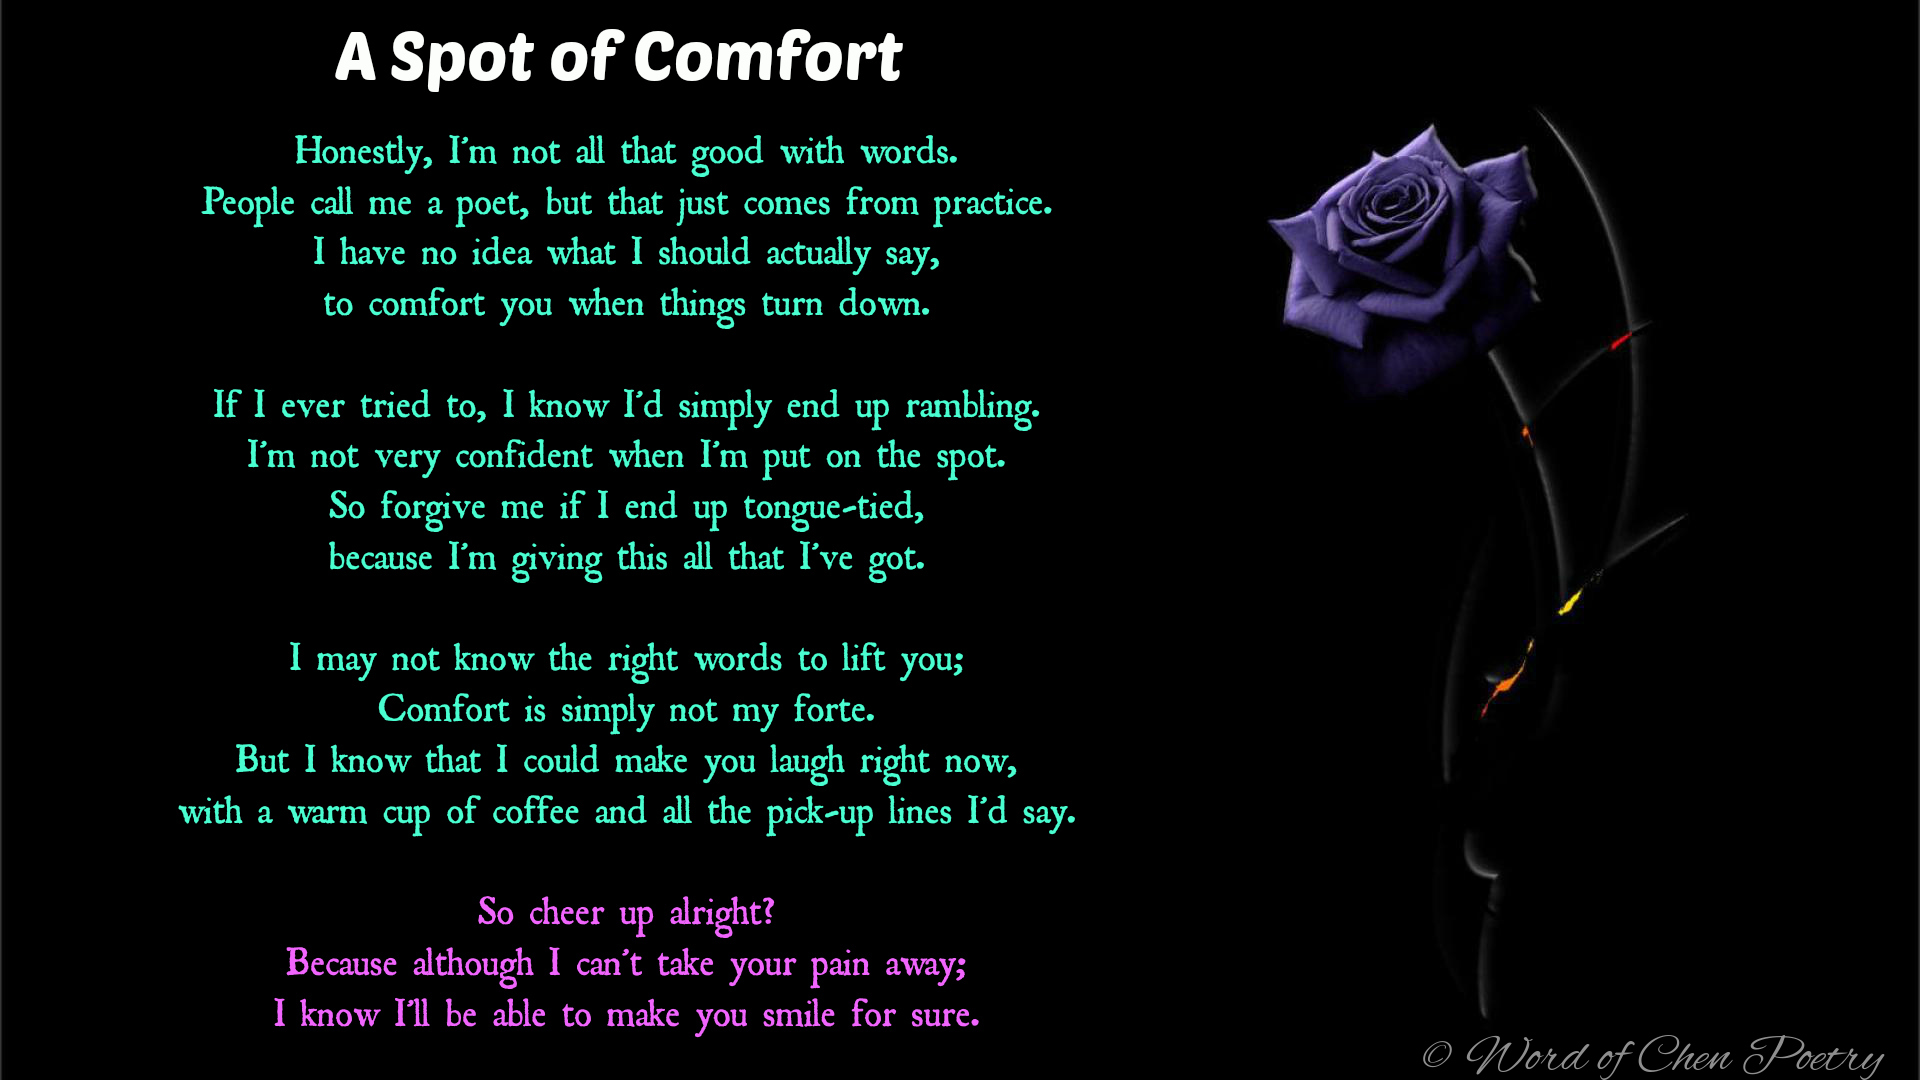 A Spot of Comfort by WordOfChen